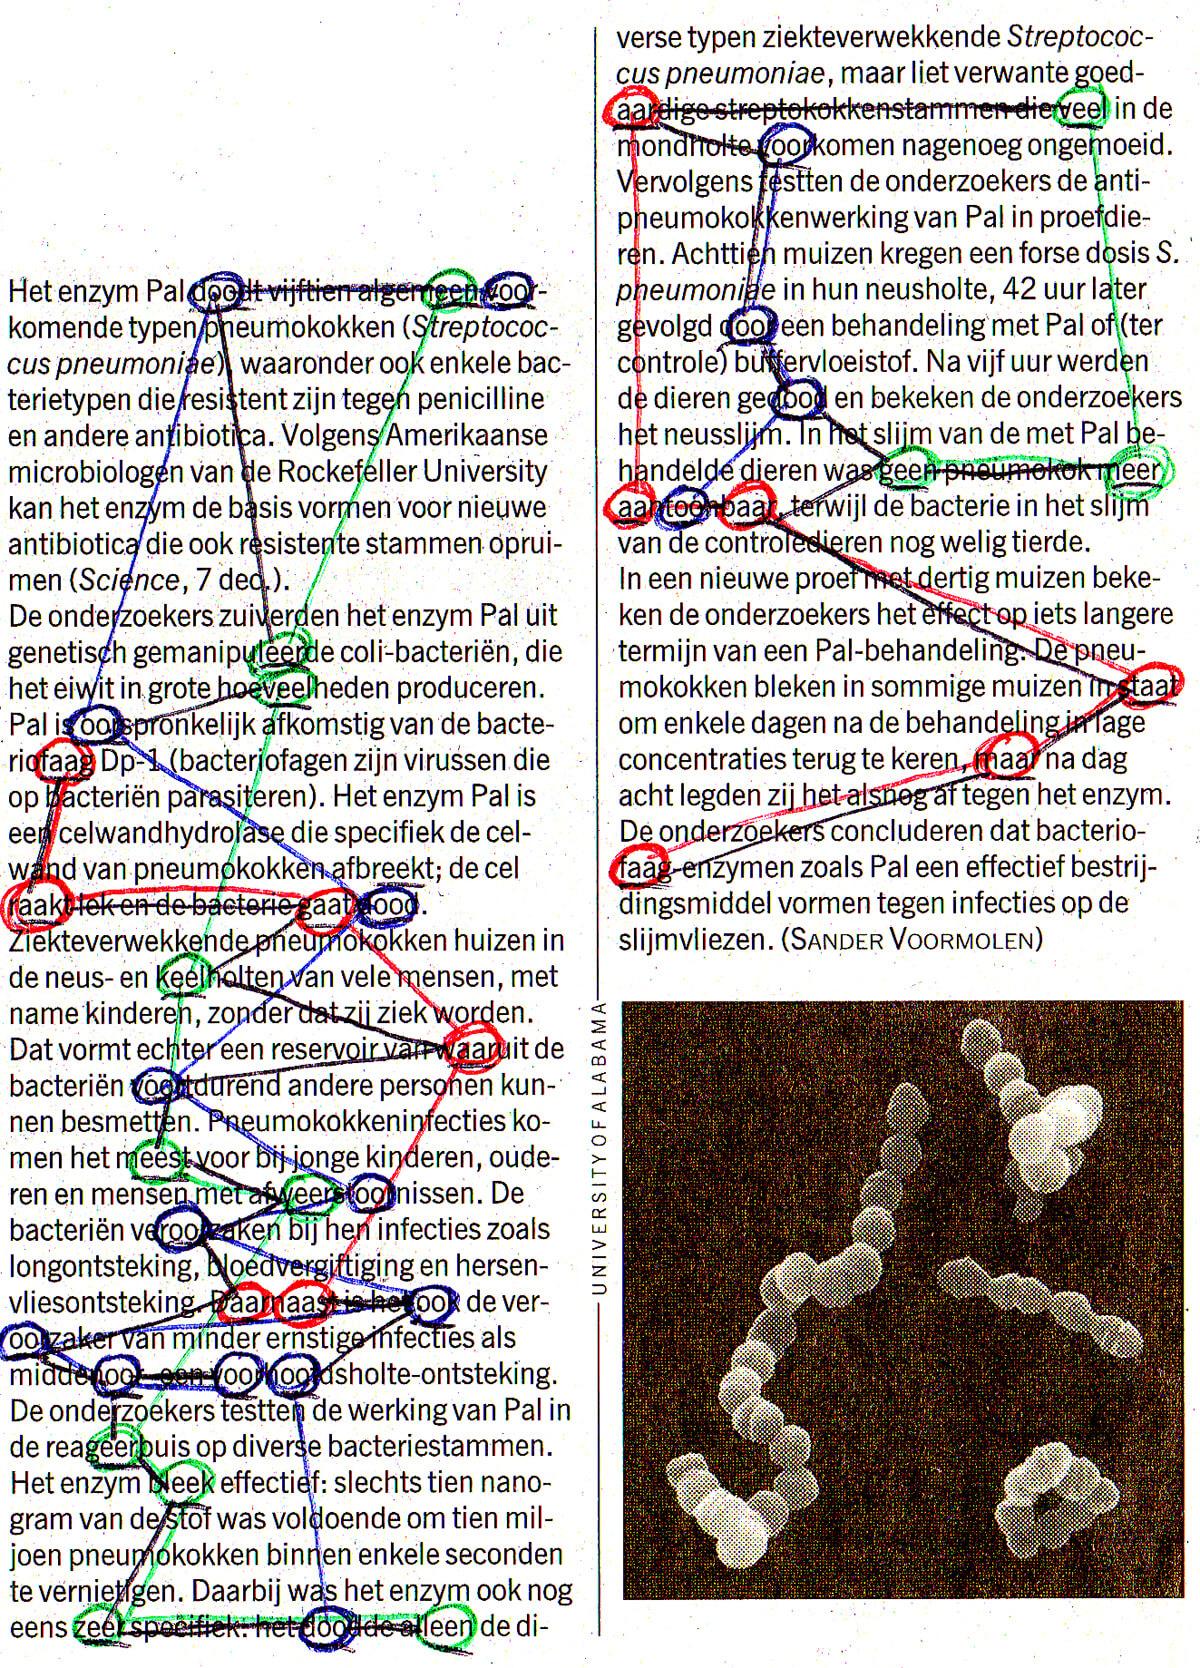 Genetic Choir, Het enzym Pal, original 16 x 11 cm, projection, 2013